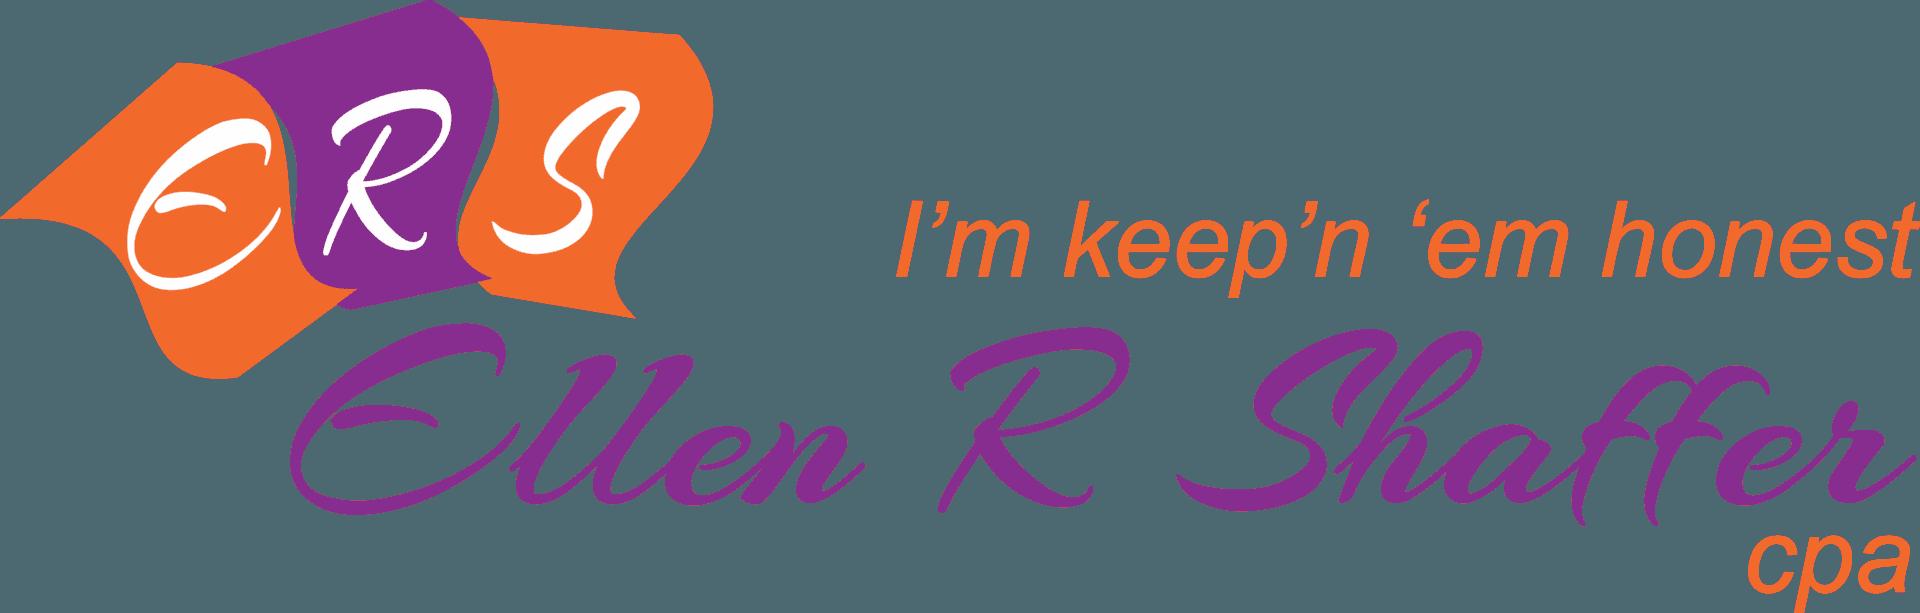 Ellen R Shaffer logo